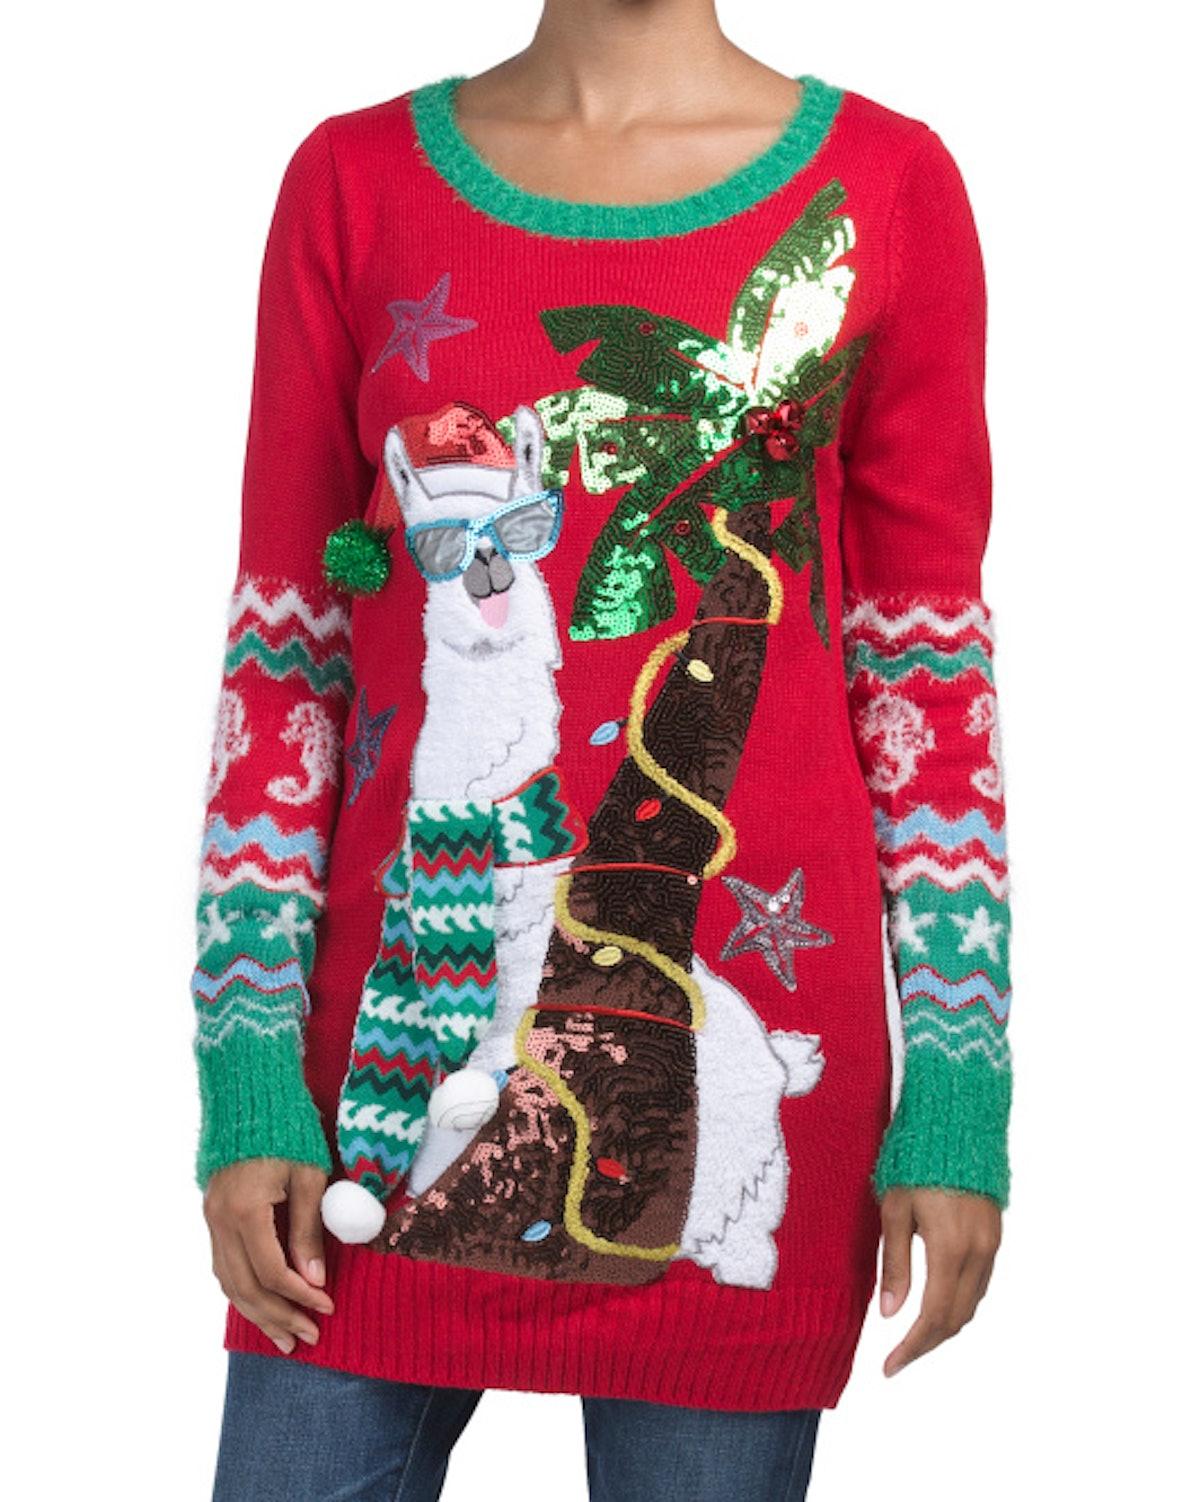 US Sweaters Llama Holiday Sweater Tunic